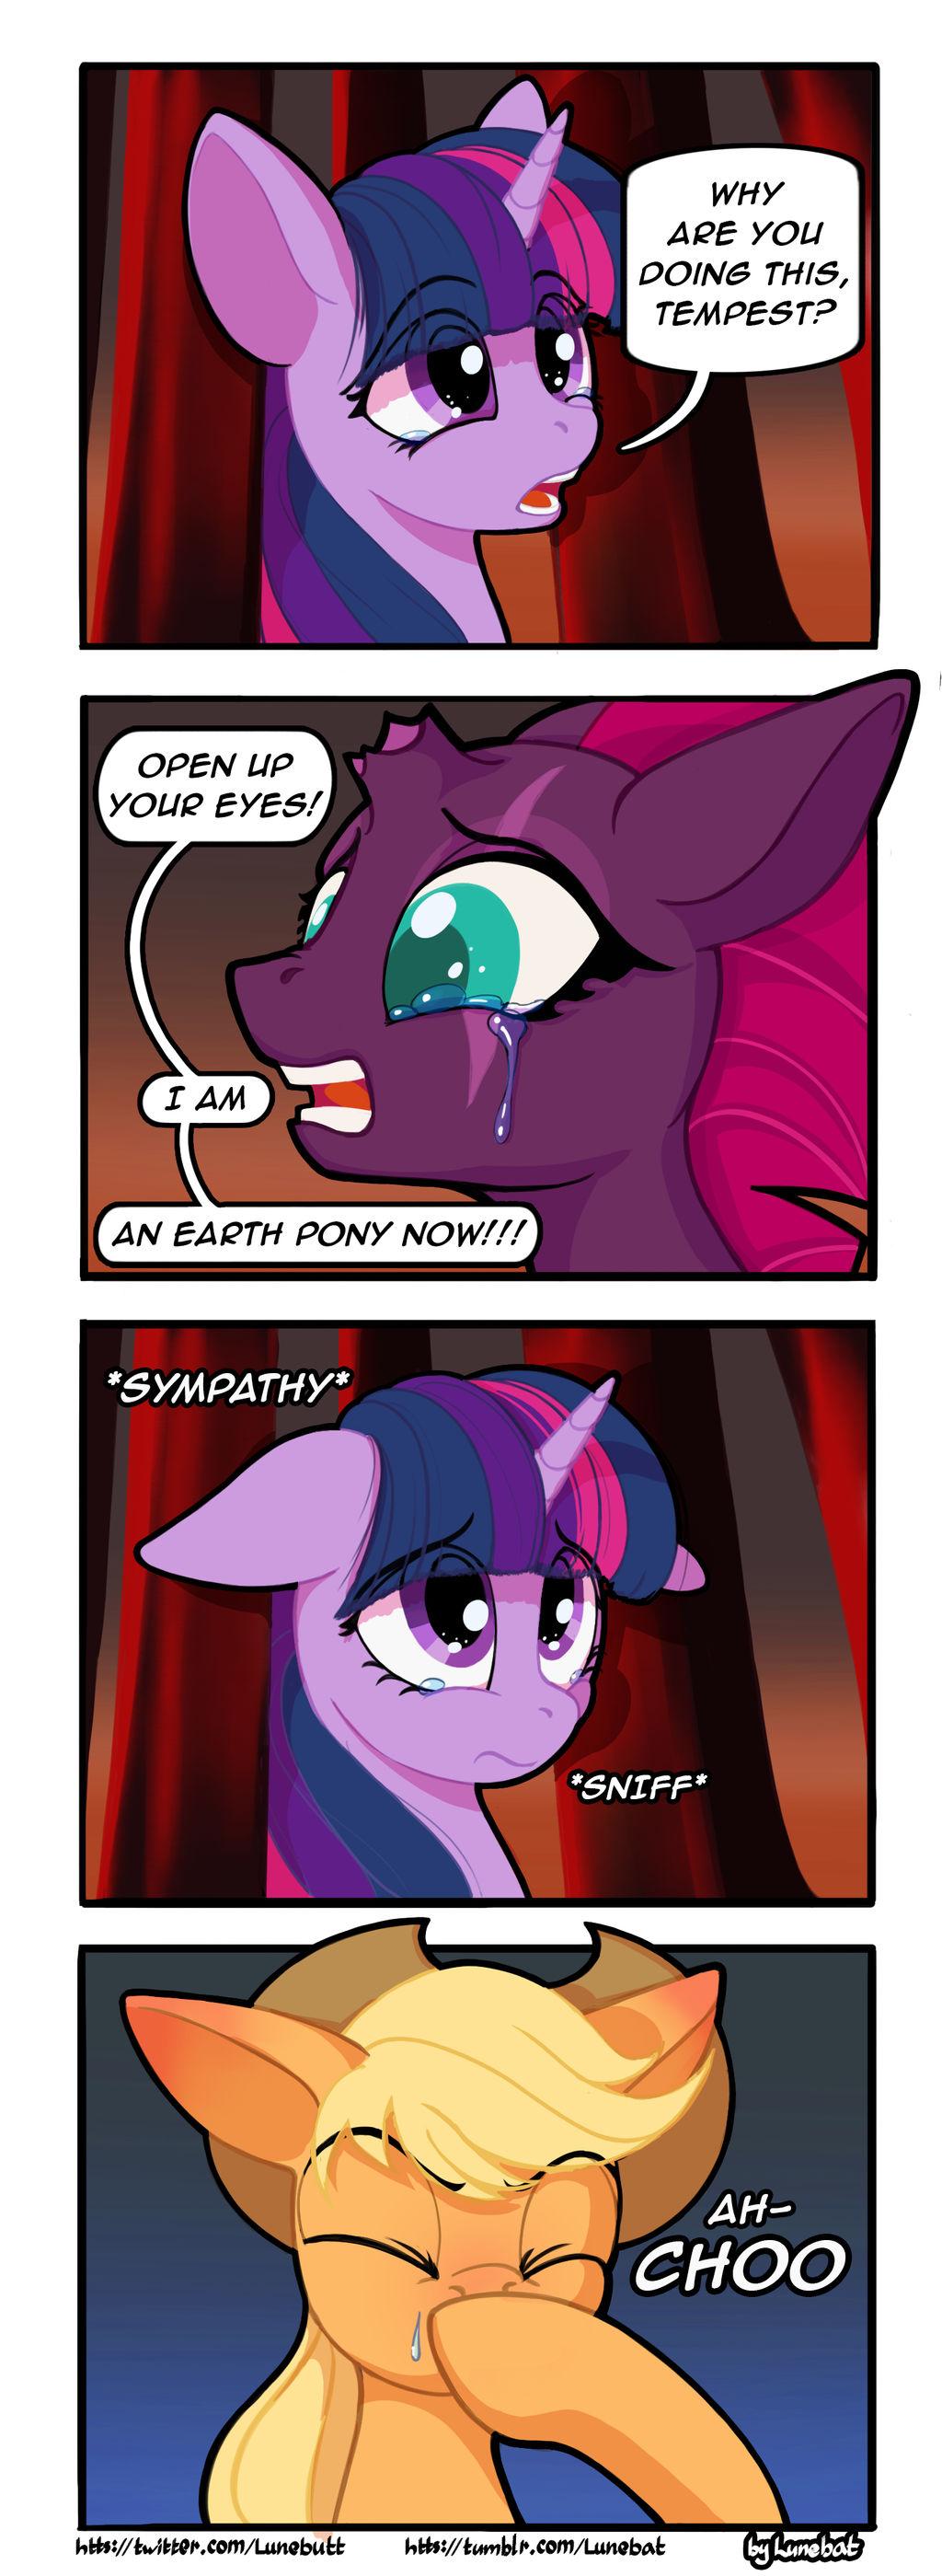 [Obrázek: mlp_comic___sympathy_by_lunebat_dctpwyi-fullview.jpg]